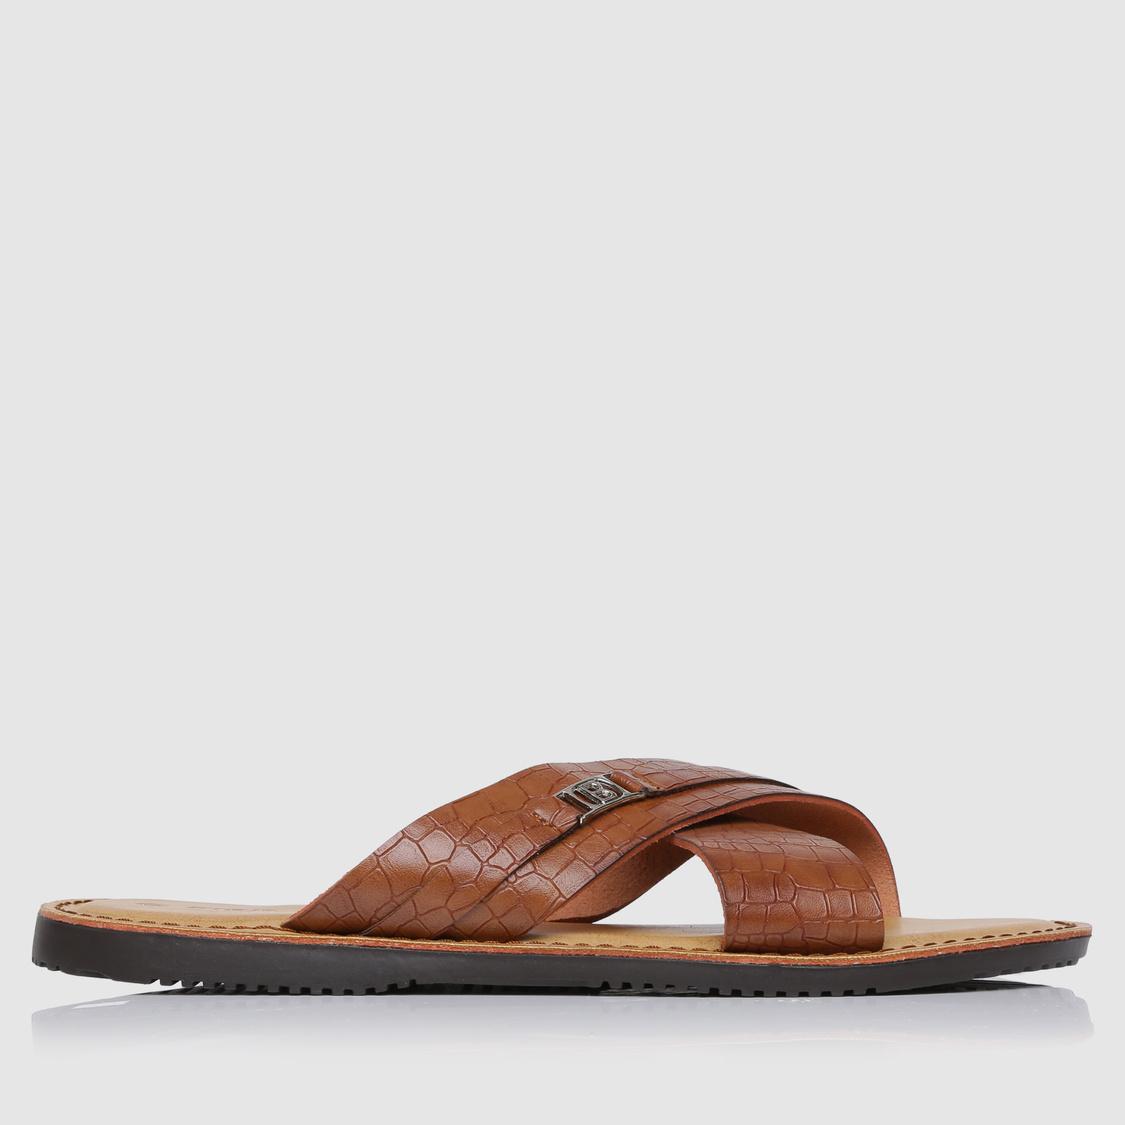 Textured Cross Over Strap Sandals